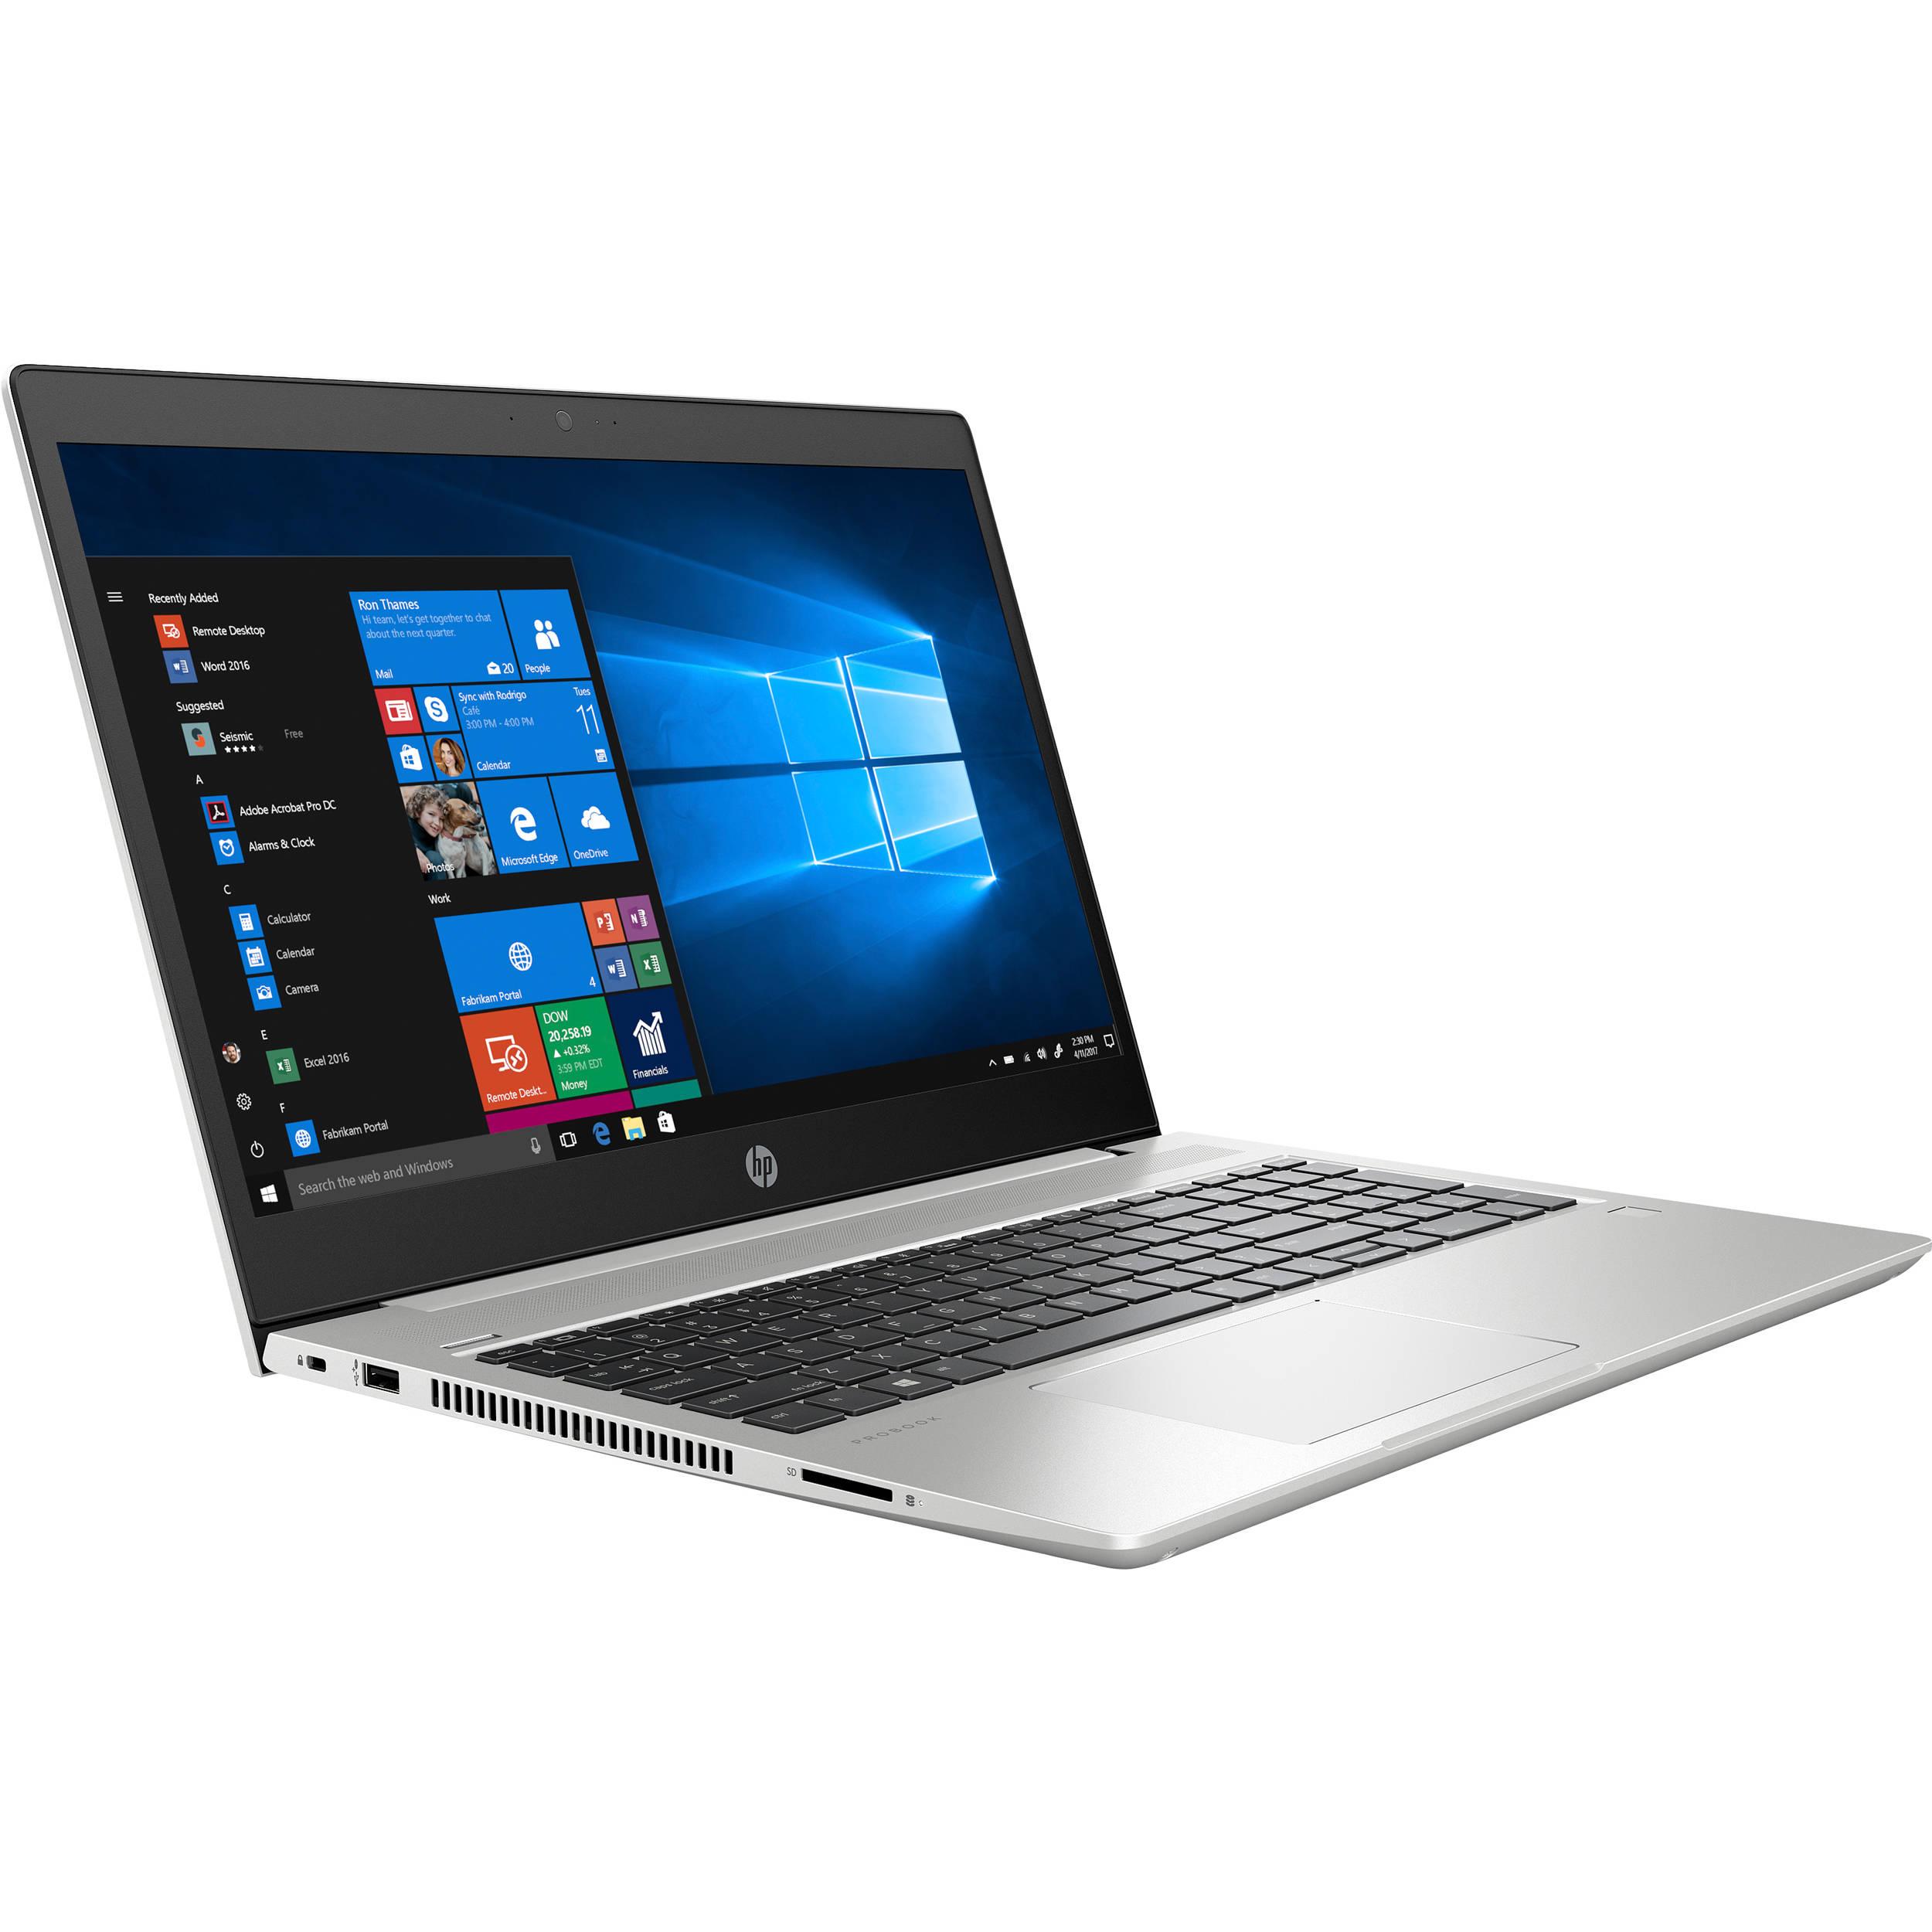 NOTEBOOK HP PROBOOK 450 G6 I7 8550U 1.8GHZ UP-TO 4GHZ 8M 8G DDR4 1T VGA NVIDIA 130MX 2G DDR5 15.6 GRAY ,Laptop Pc